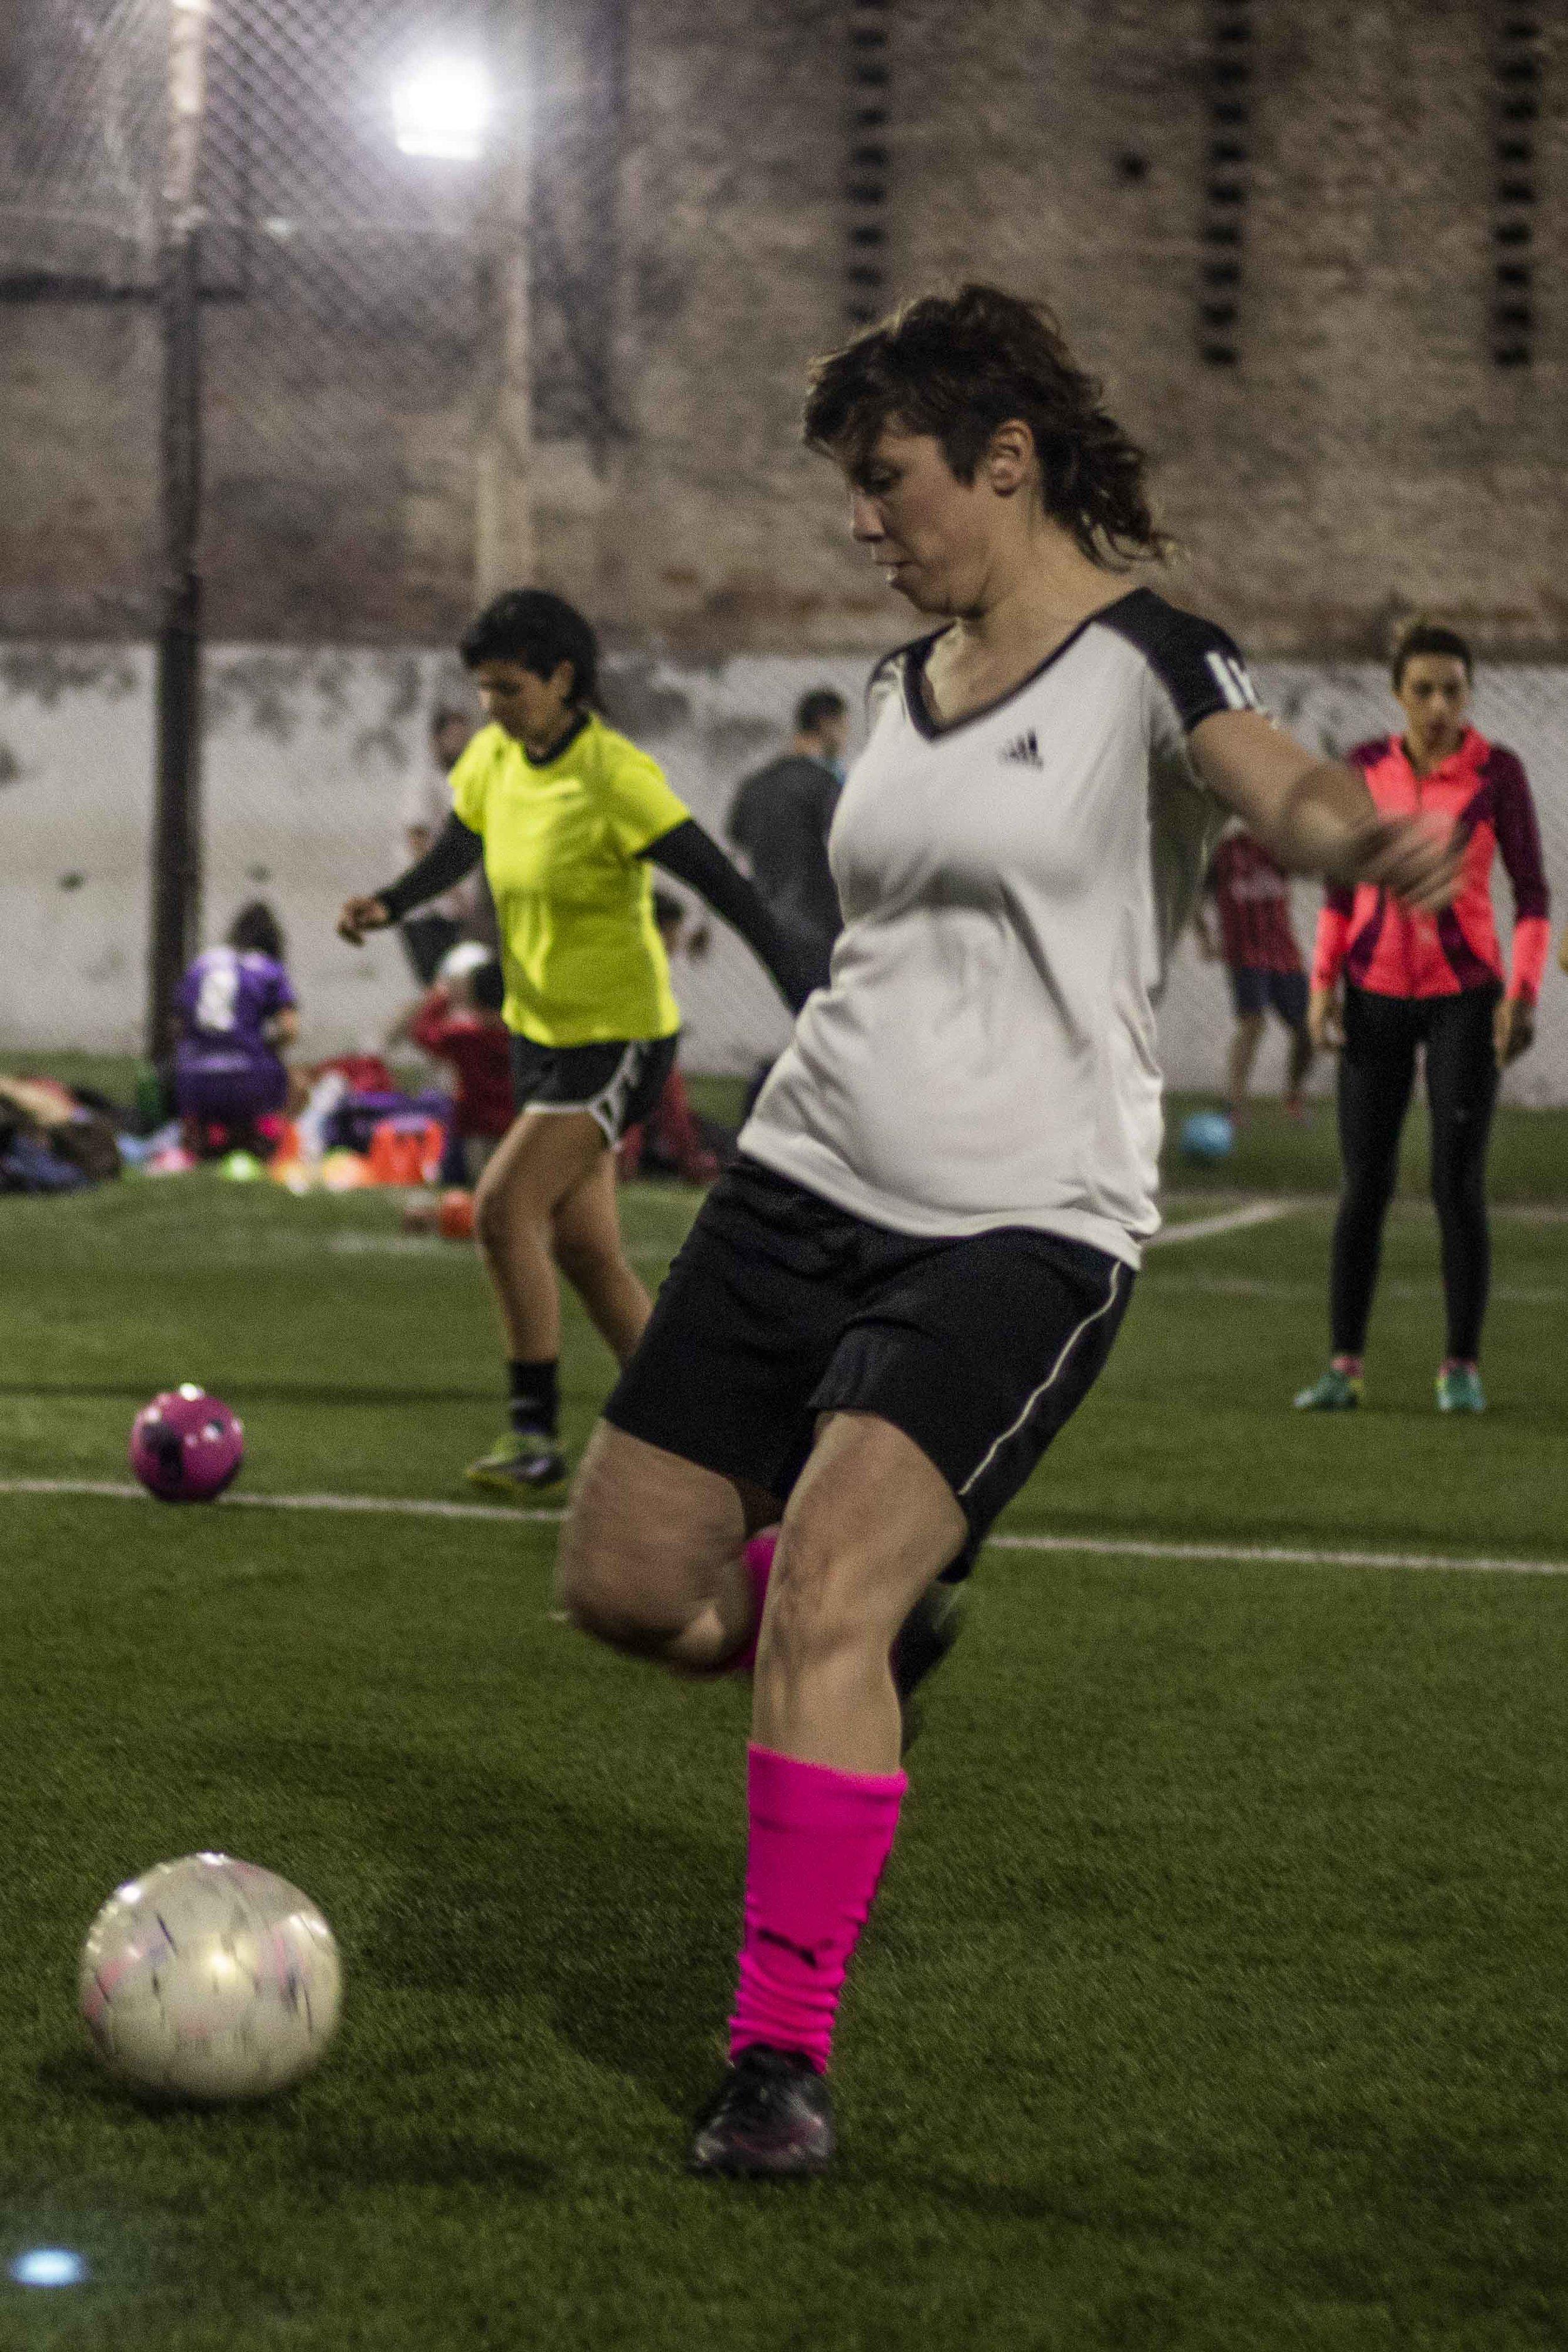 la-comarca-fútbol-femenino-tucumán-la-palta-ignacio-lopez-isasmendi01.JPG